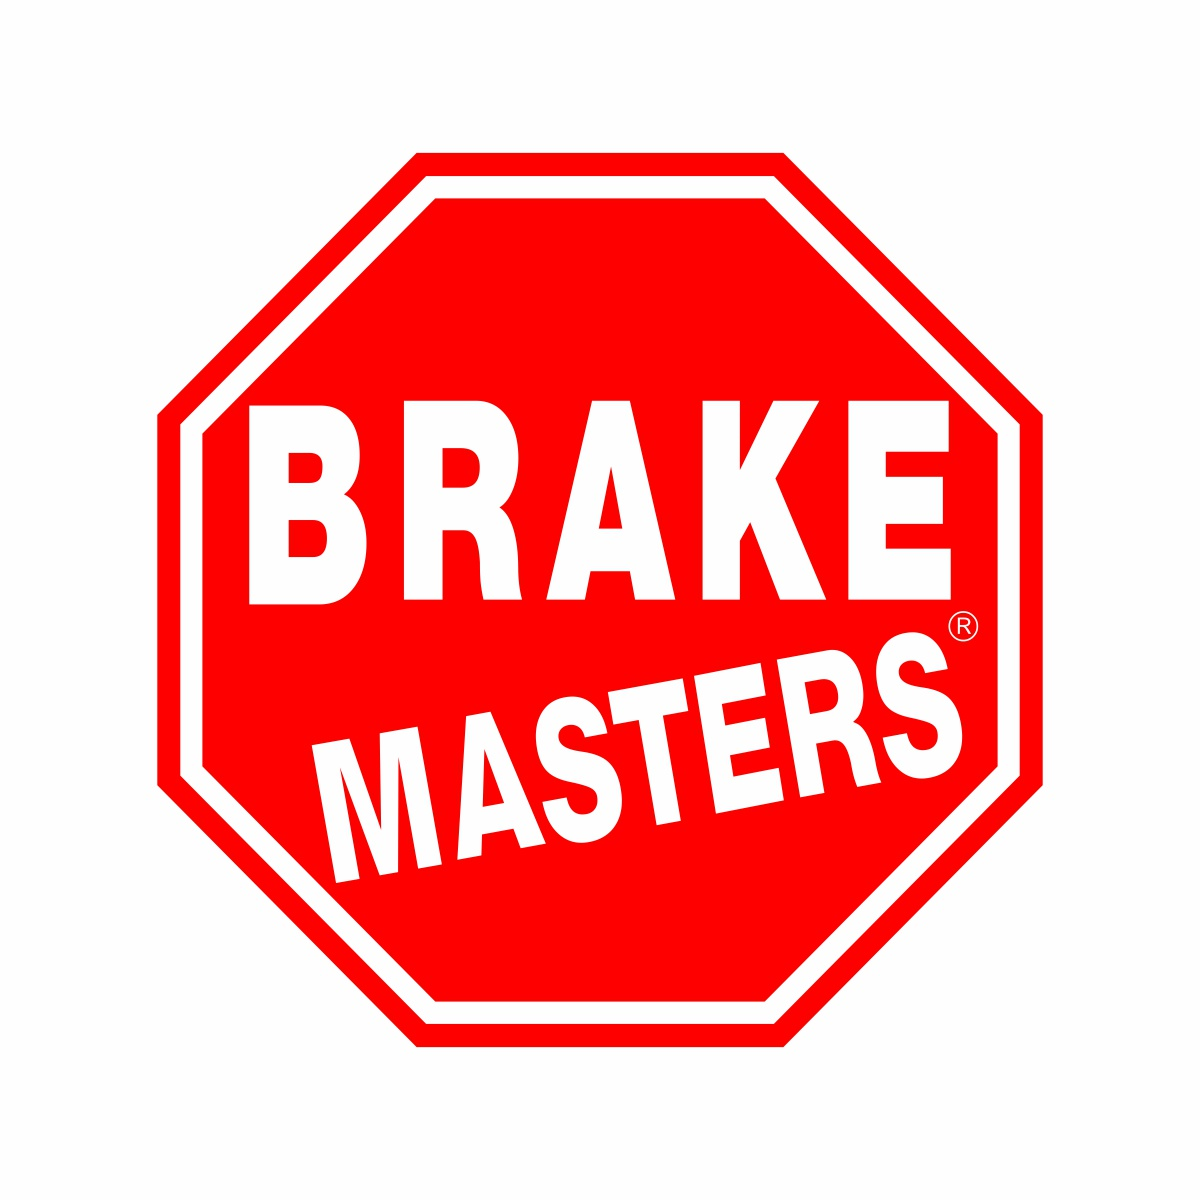 https://secureservercdn.net/45.40.150.47/08r.a40.myftpupload.com/wp-content/uploads/2019/04/Brake-Masters.jpg